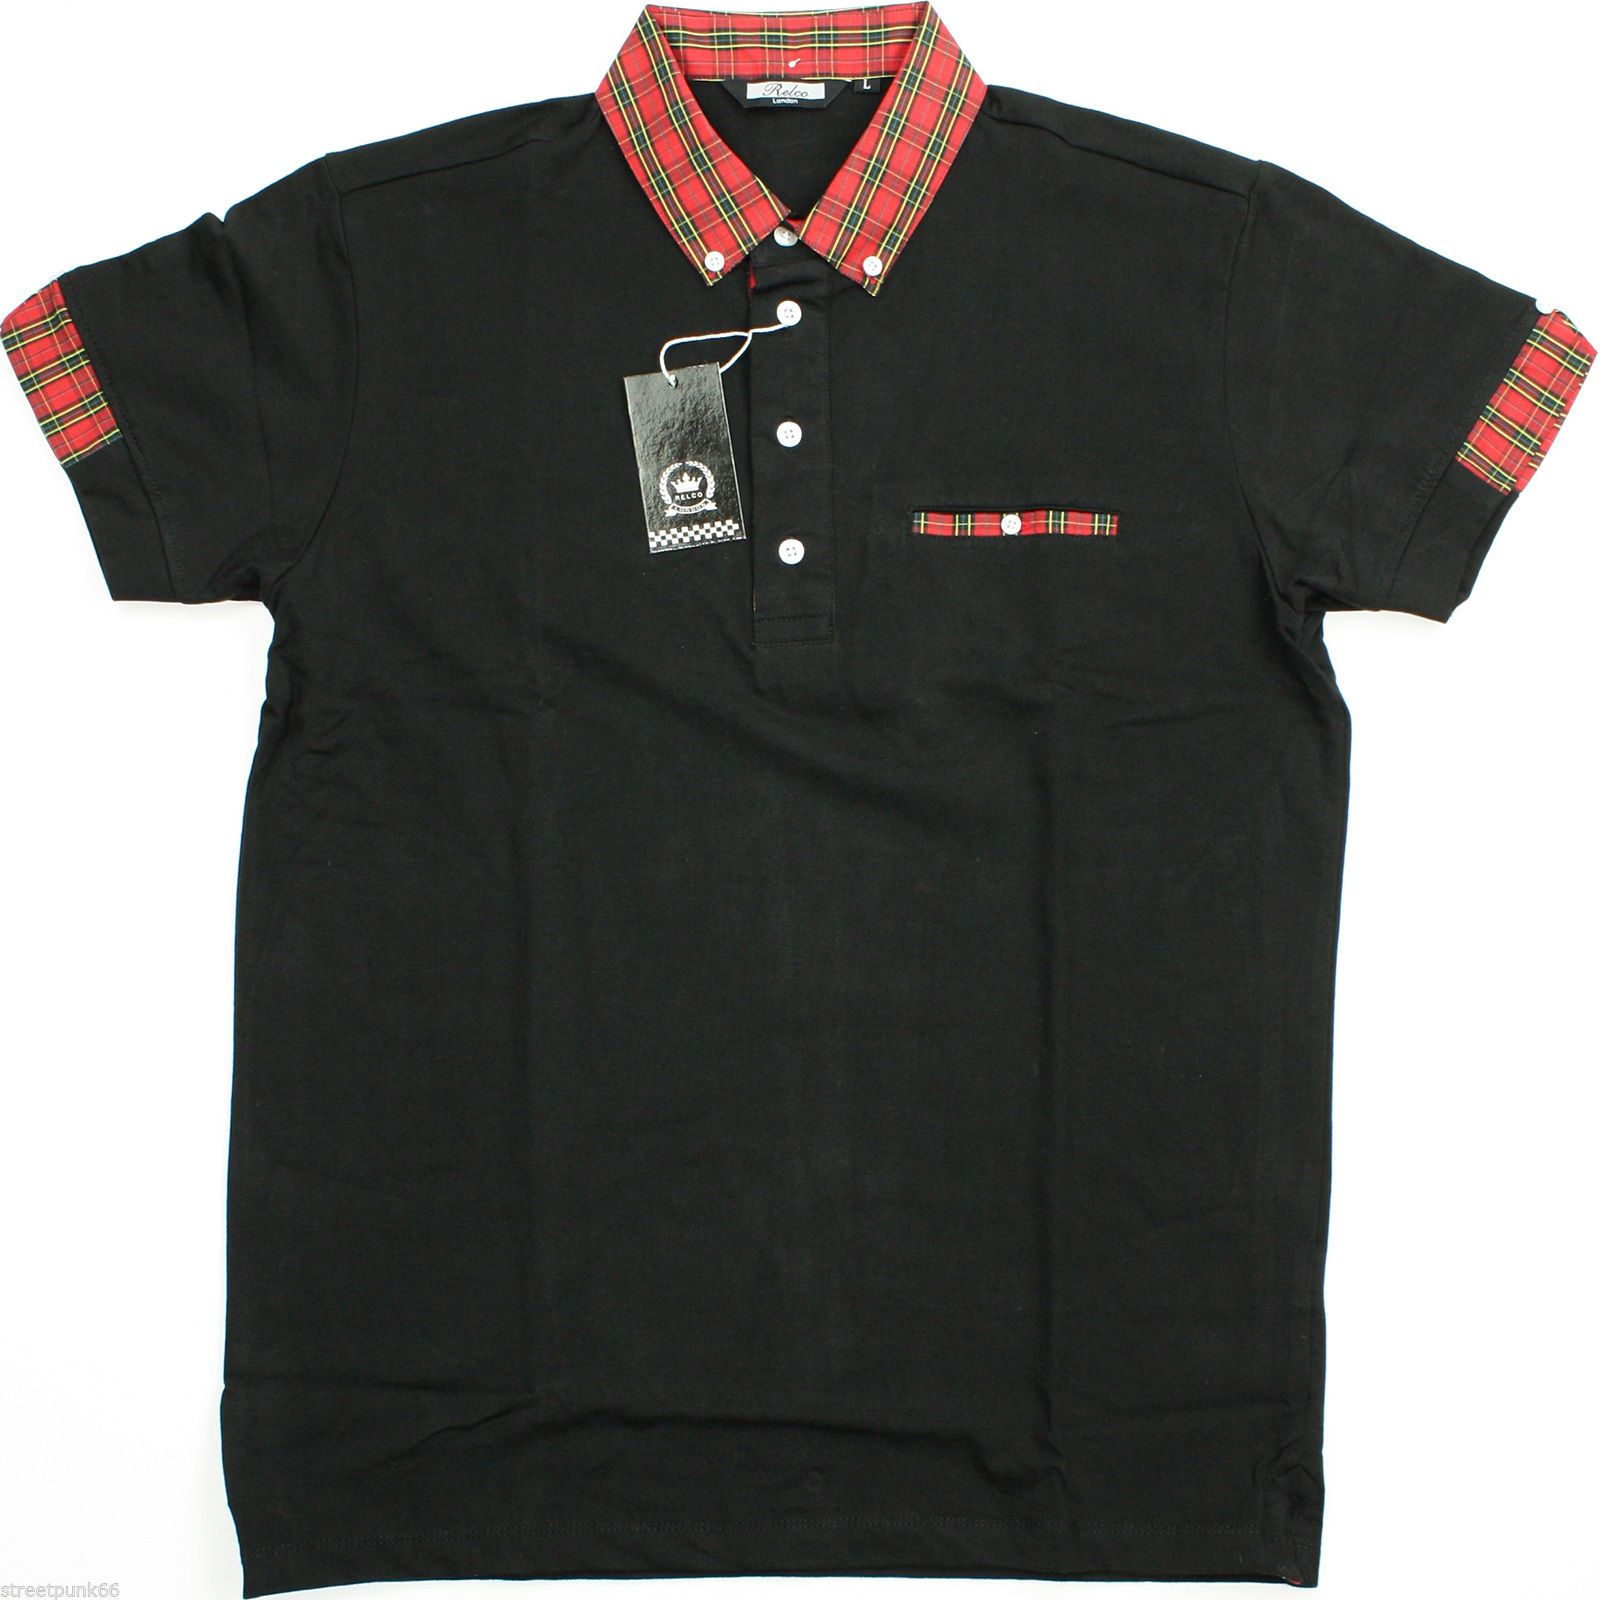 Black t shirt red collar - Relco Mens Black Polo Shirt Button Down Red Tartan Collar Mod Ska Skin Casual